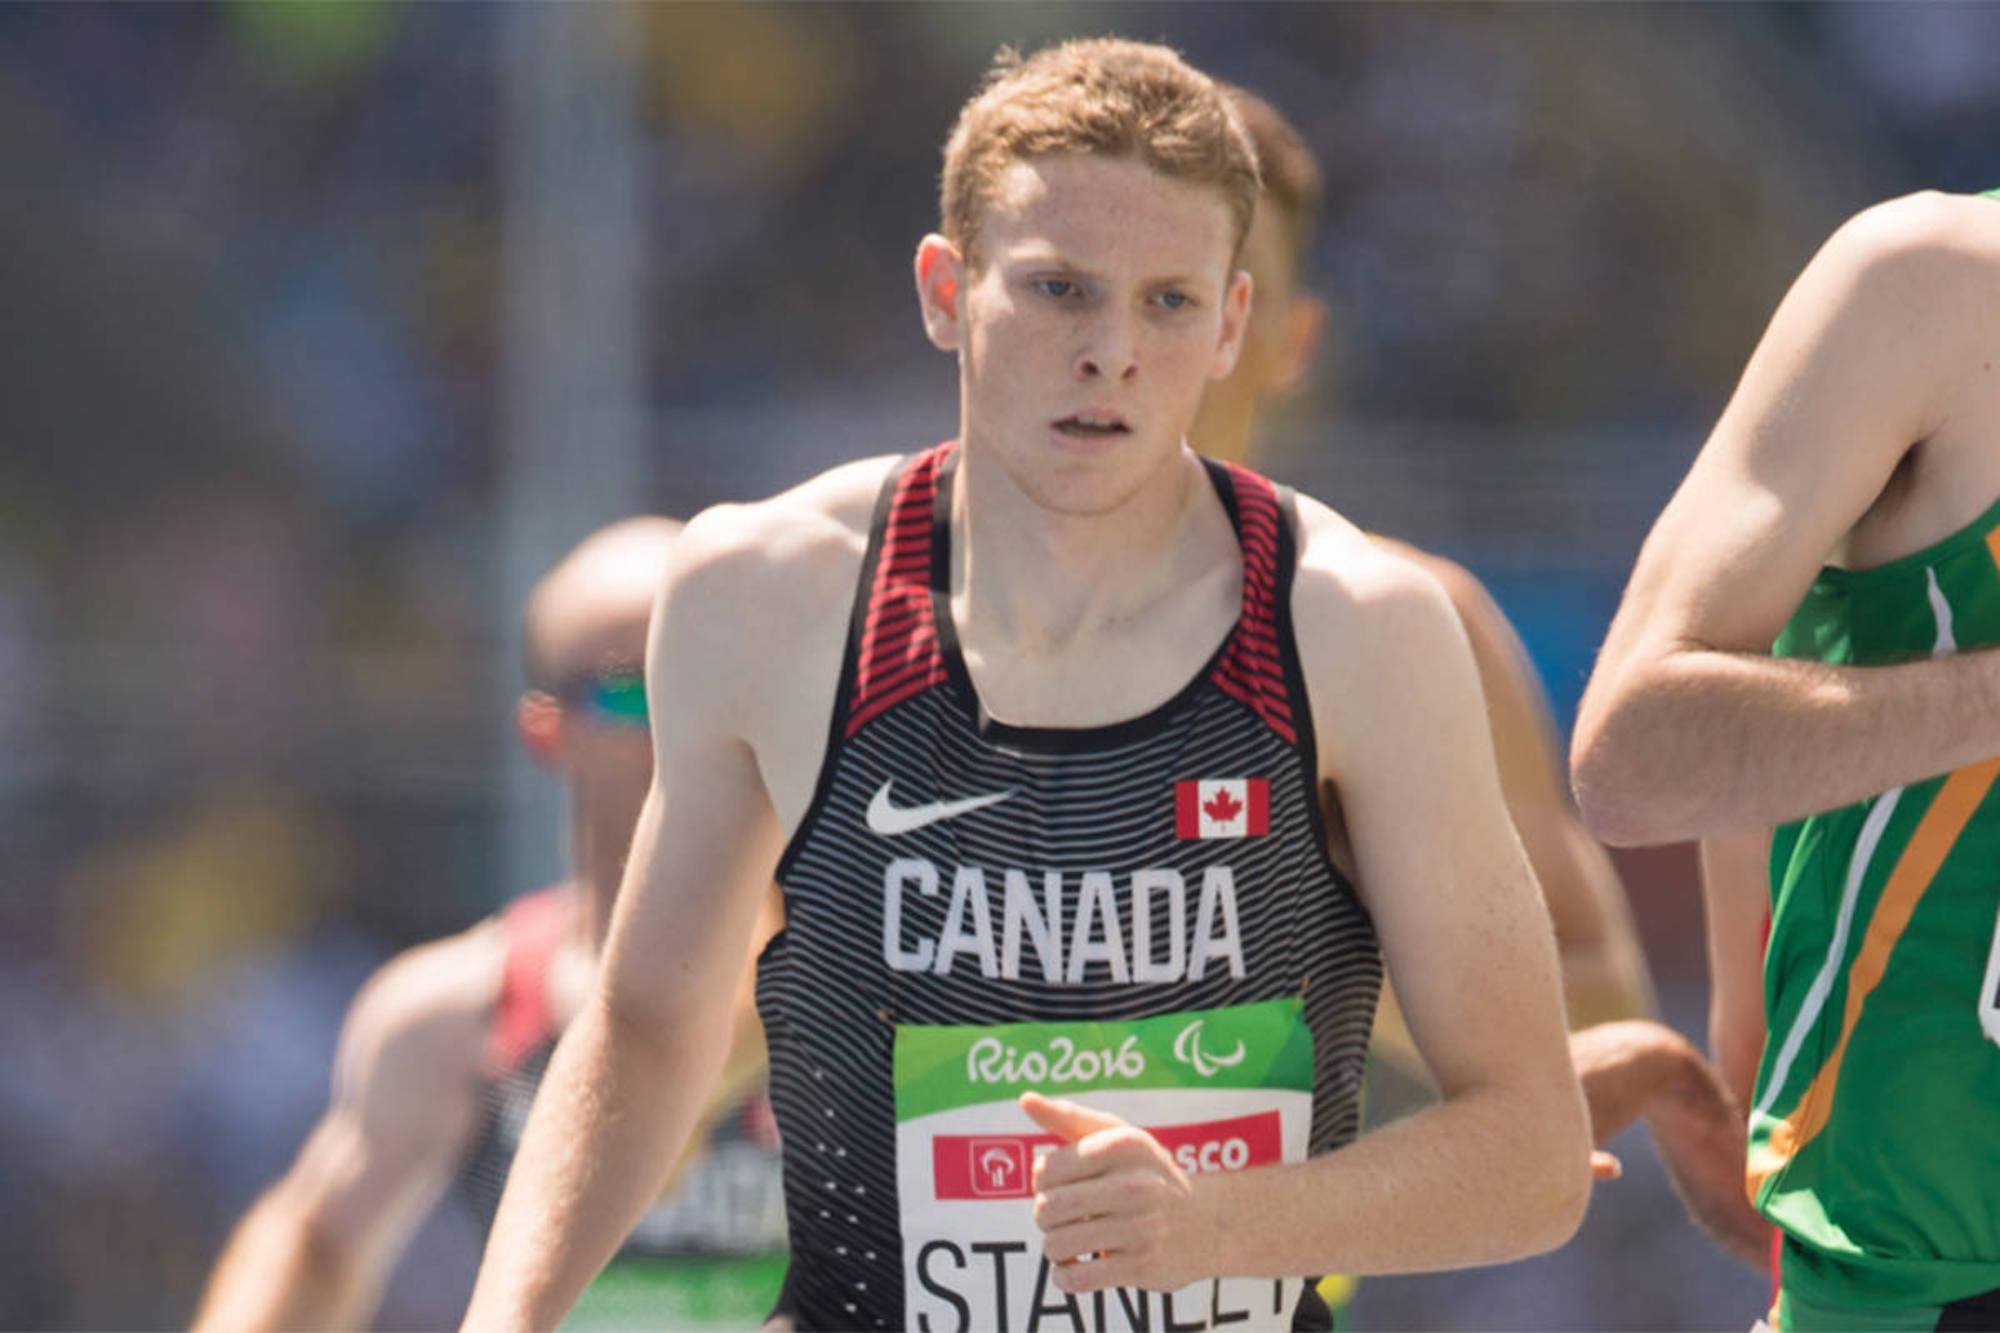 Liam Stanley was born to run